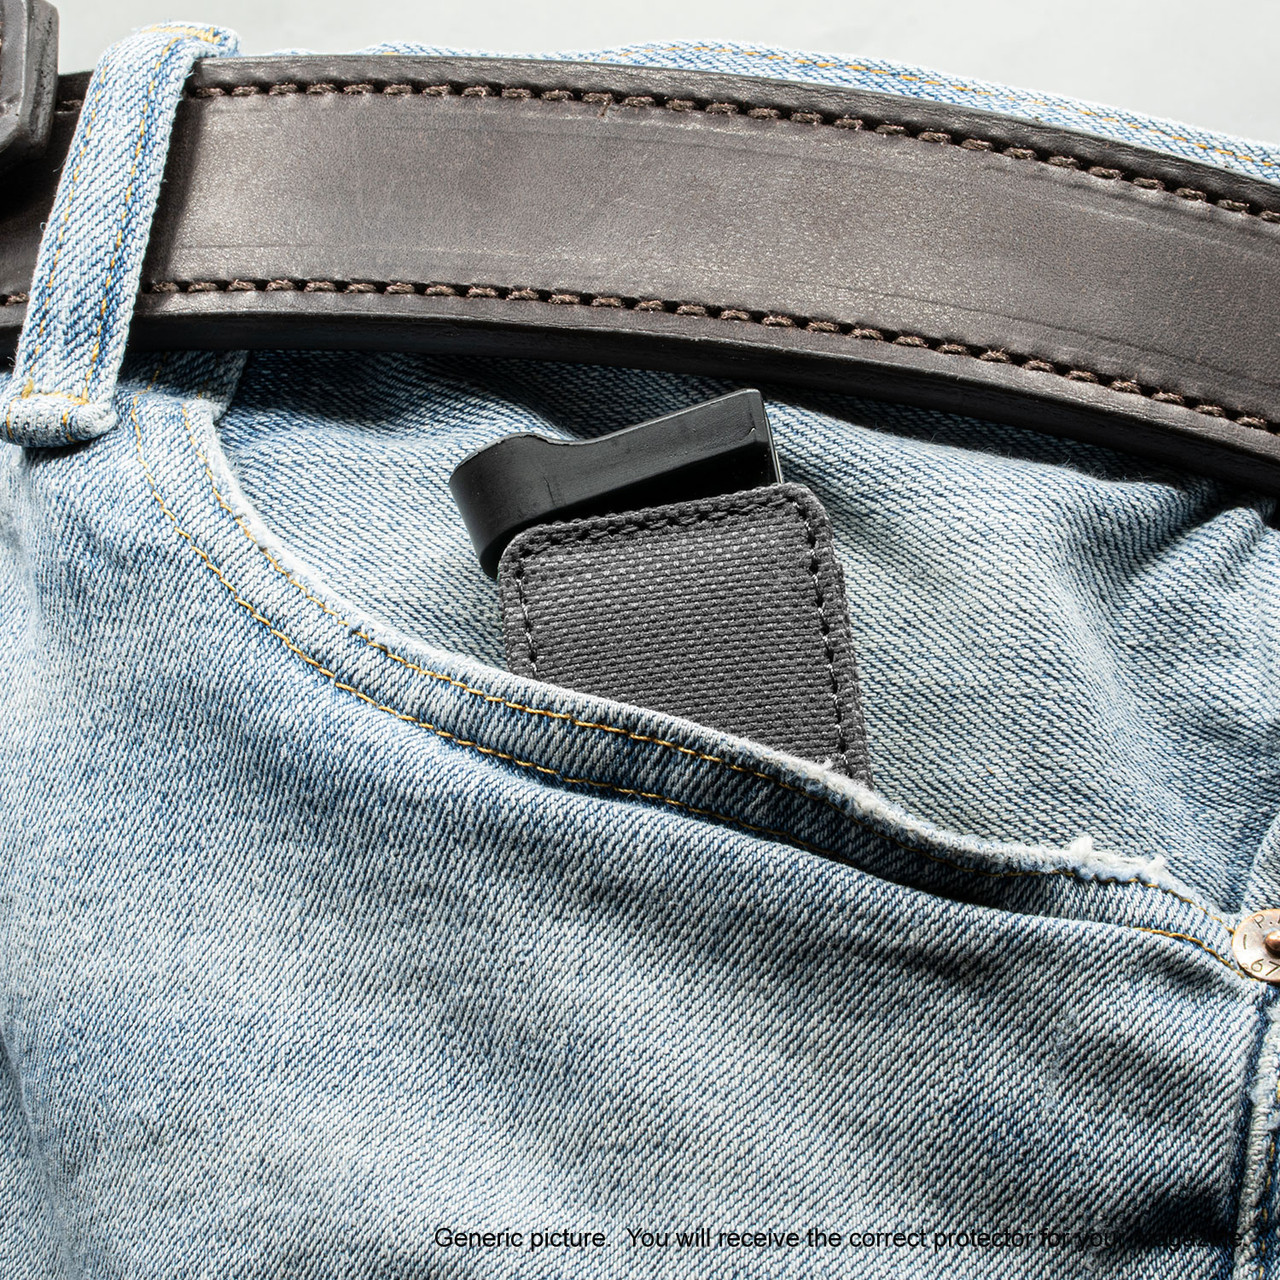 Beretta 84fs Cheetah Grey Covert Magazine Pocket Protector